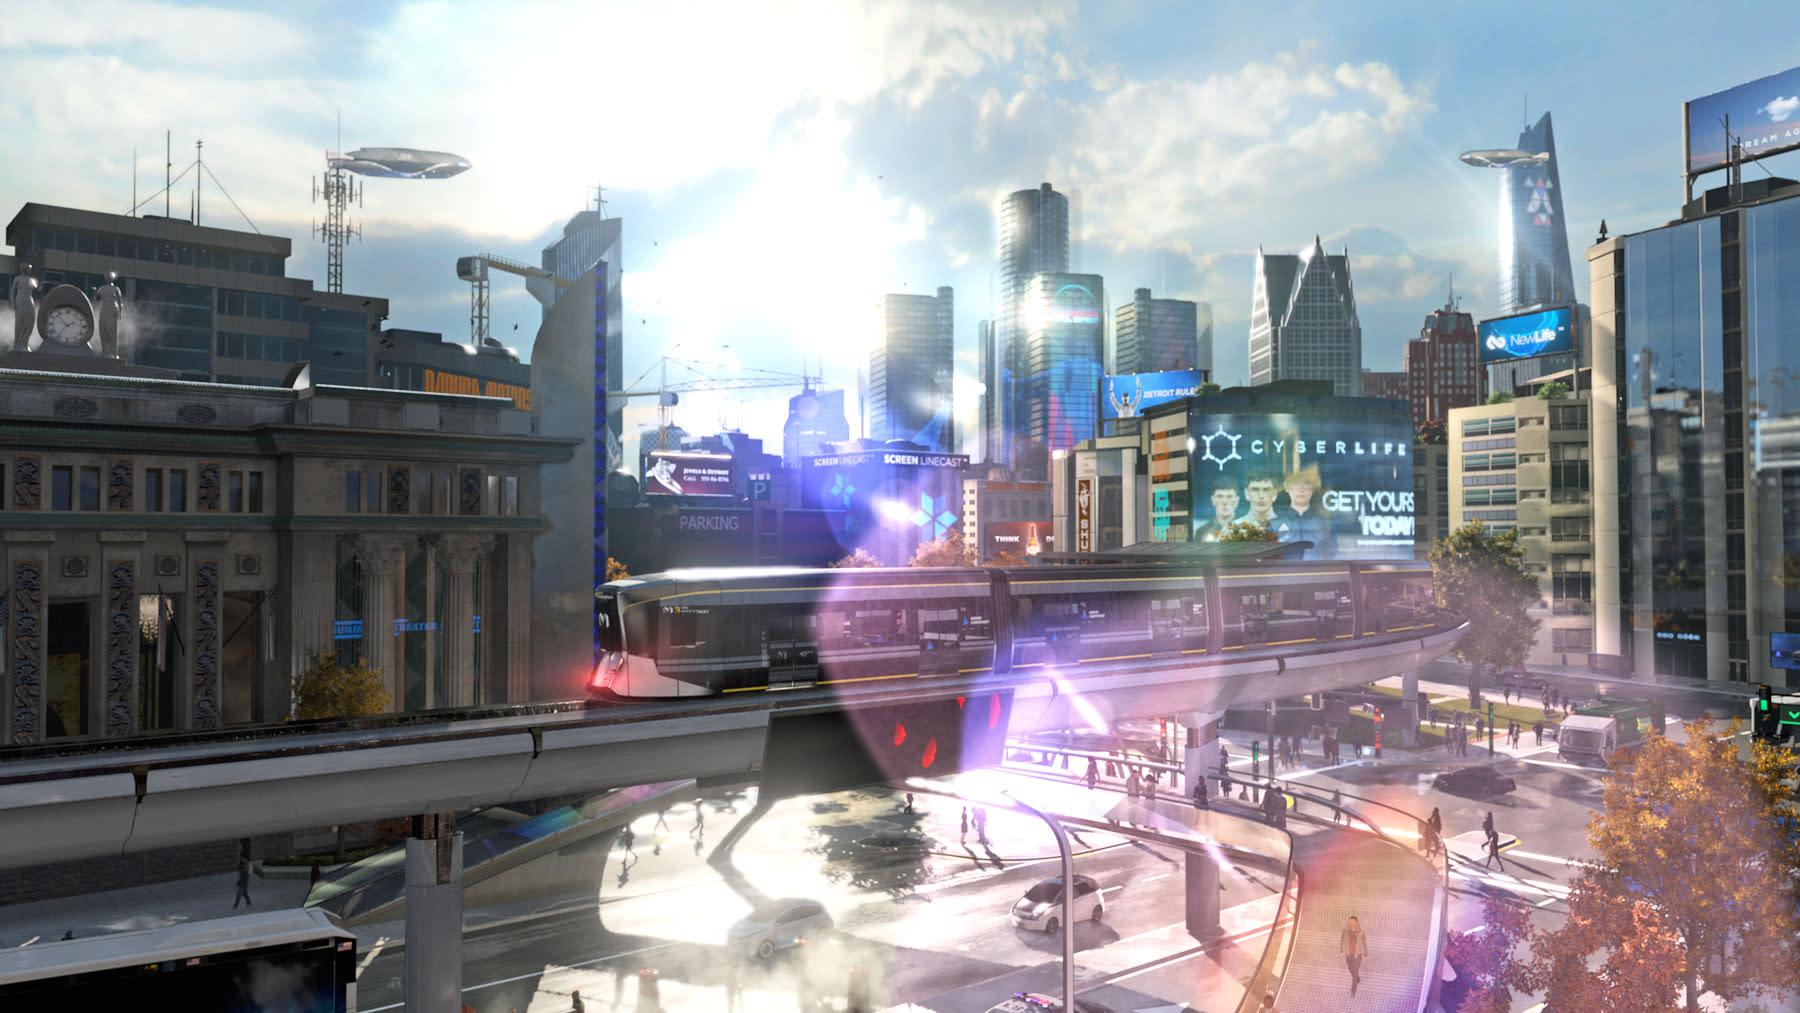 Quantic Dream / Sony Interactive Entertainment